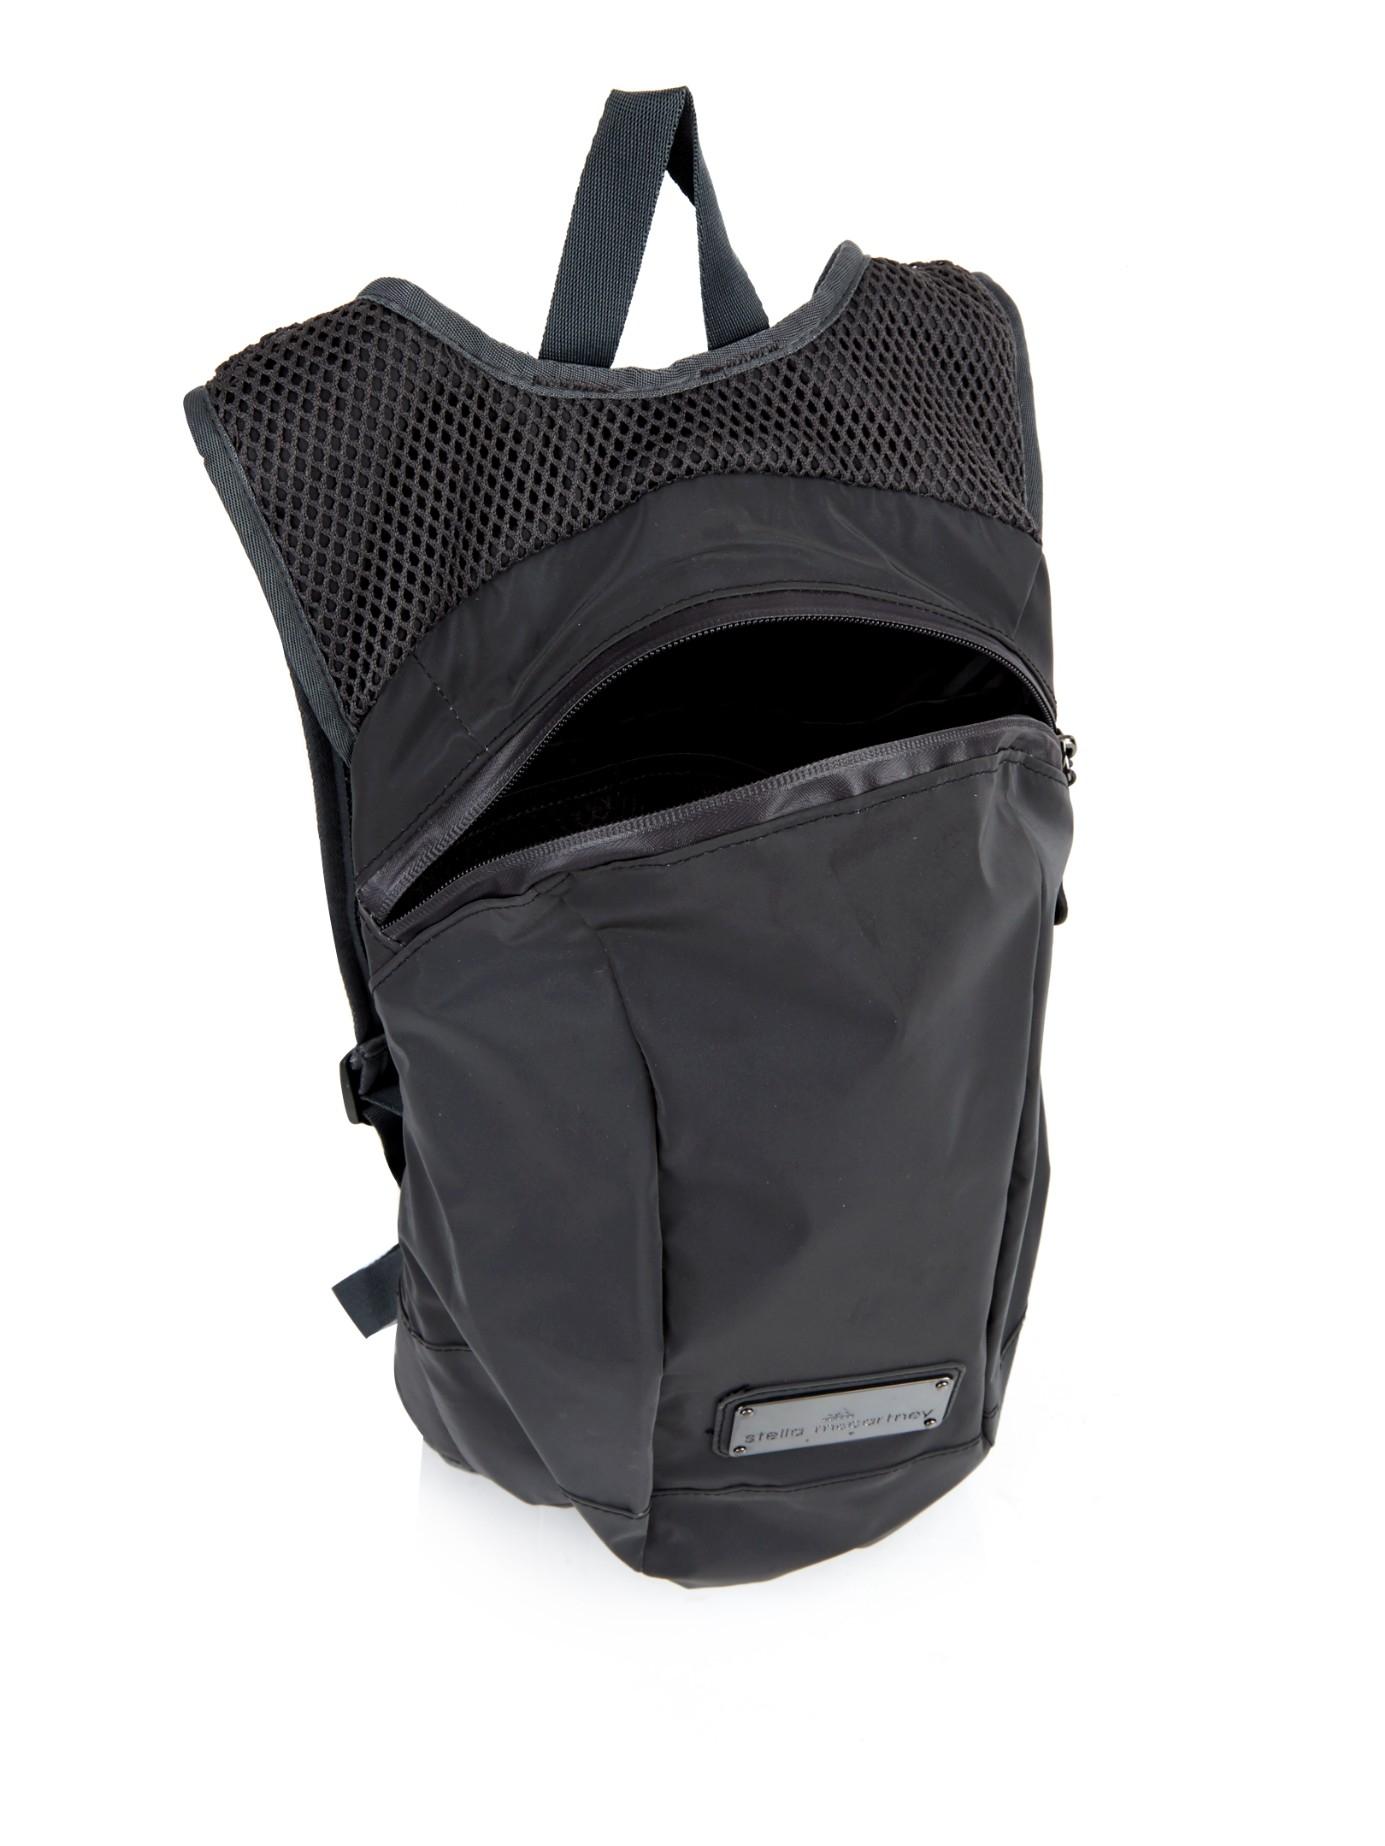 Adidas By Stella Mccartney Running Backpack In Black Lyst